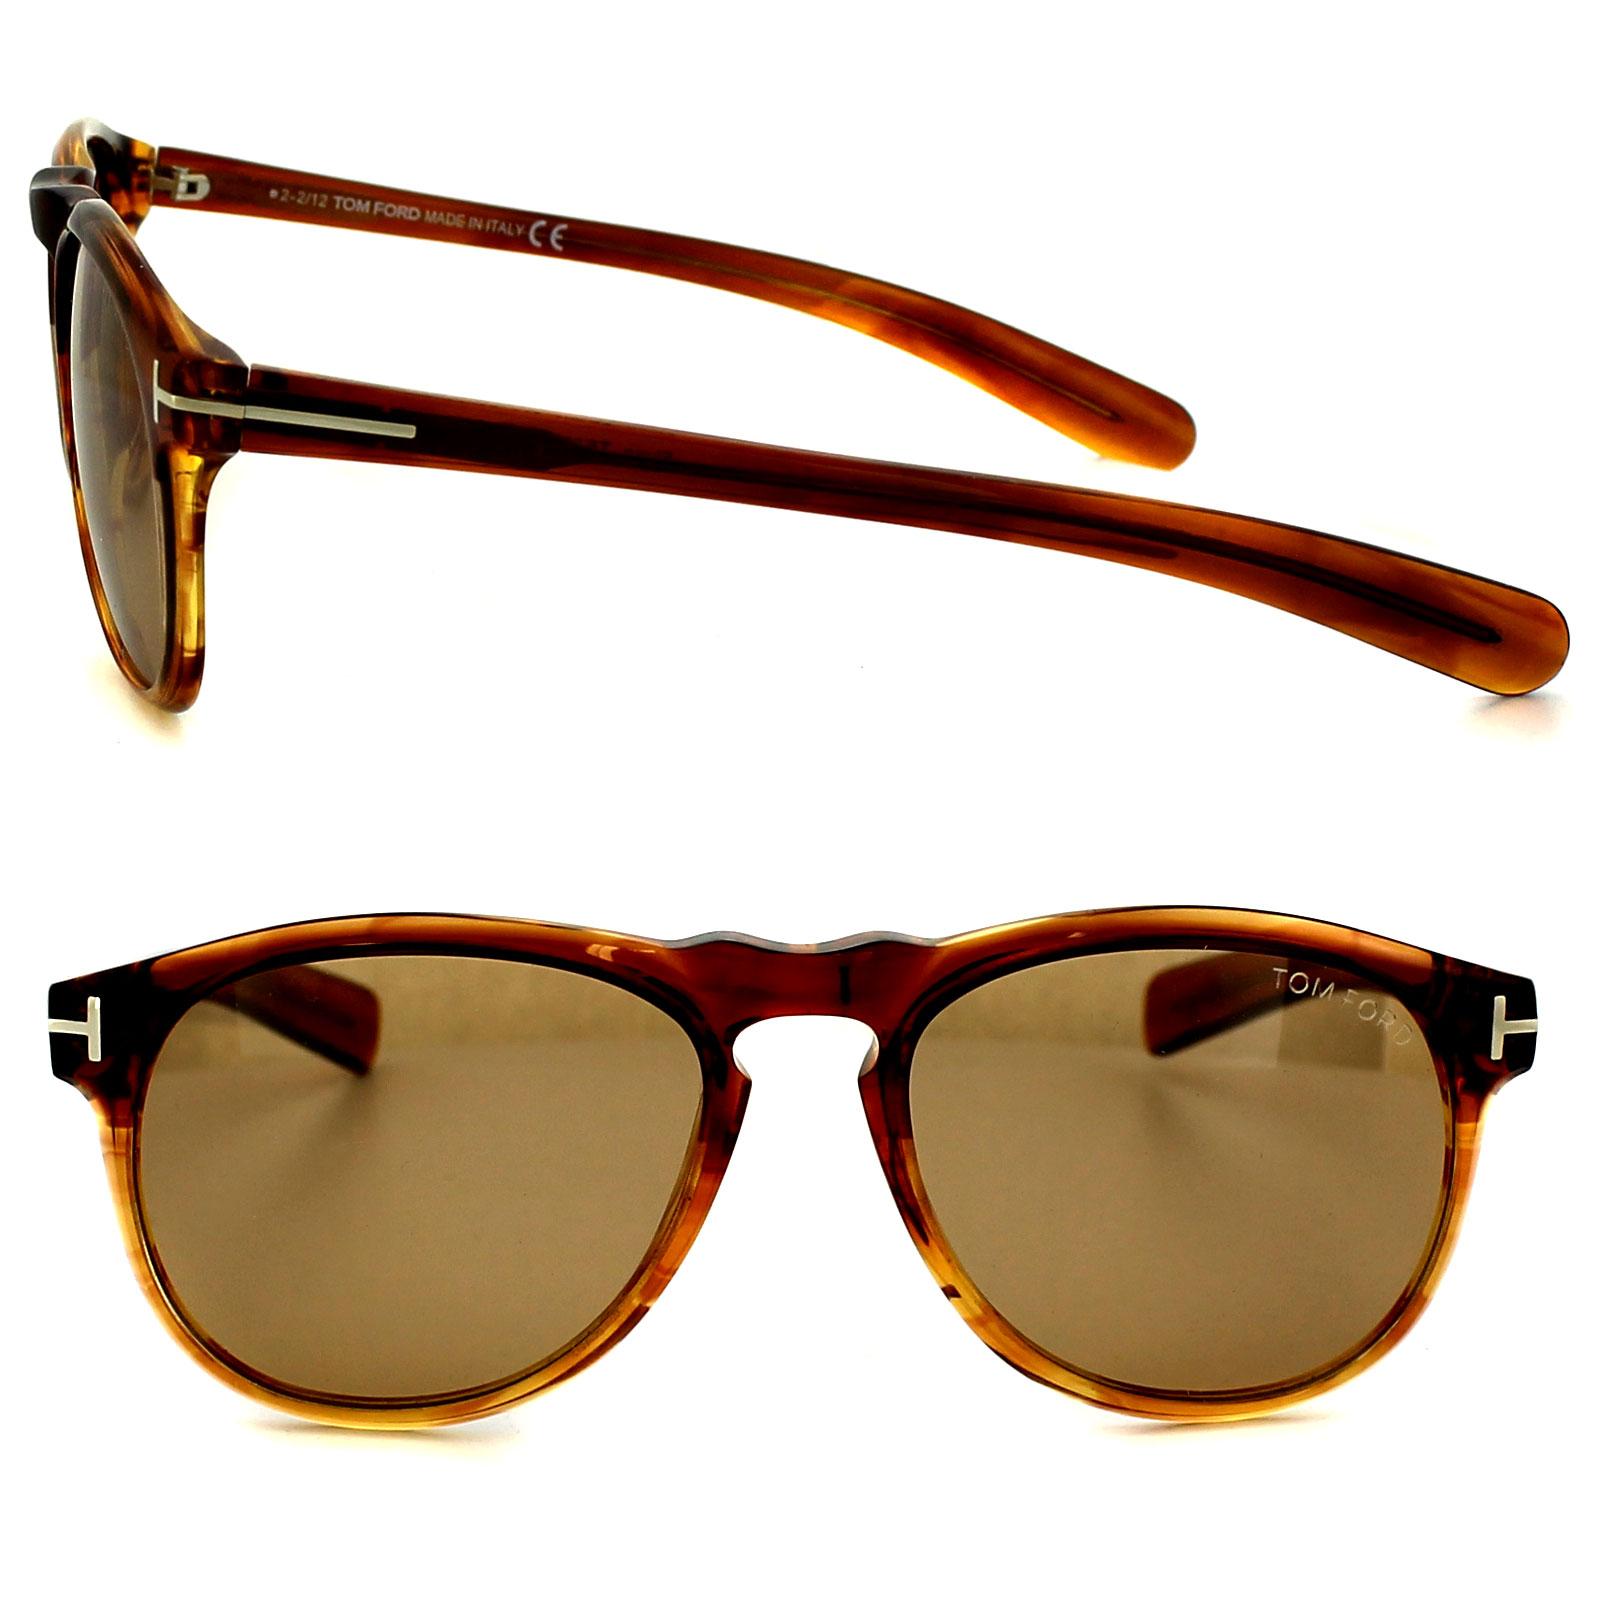 Cheap Tom Ford 0291 Flynn Sunglasses - Discounted Sunglasses